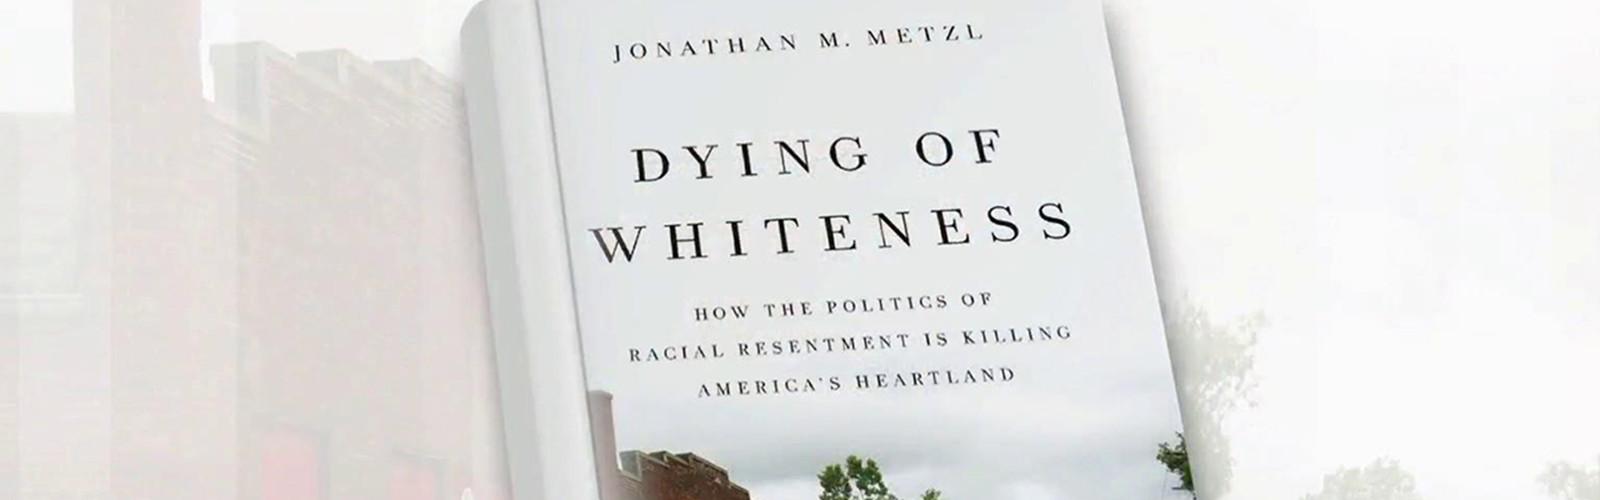 Professor Jonathan Metzl's new book explores the health consequences of backlash politics